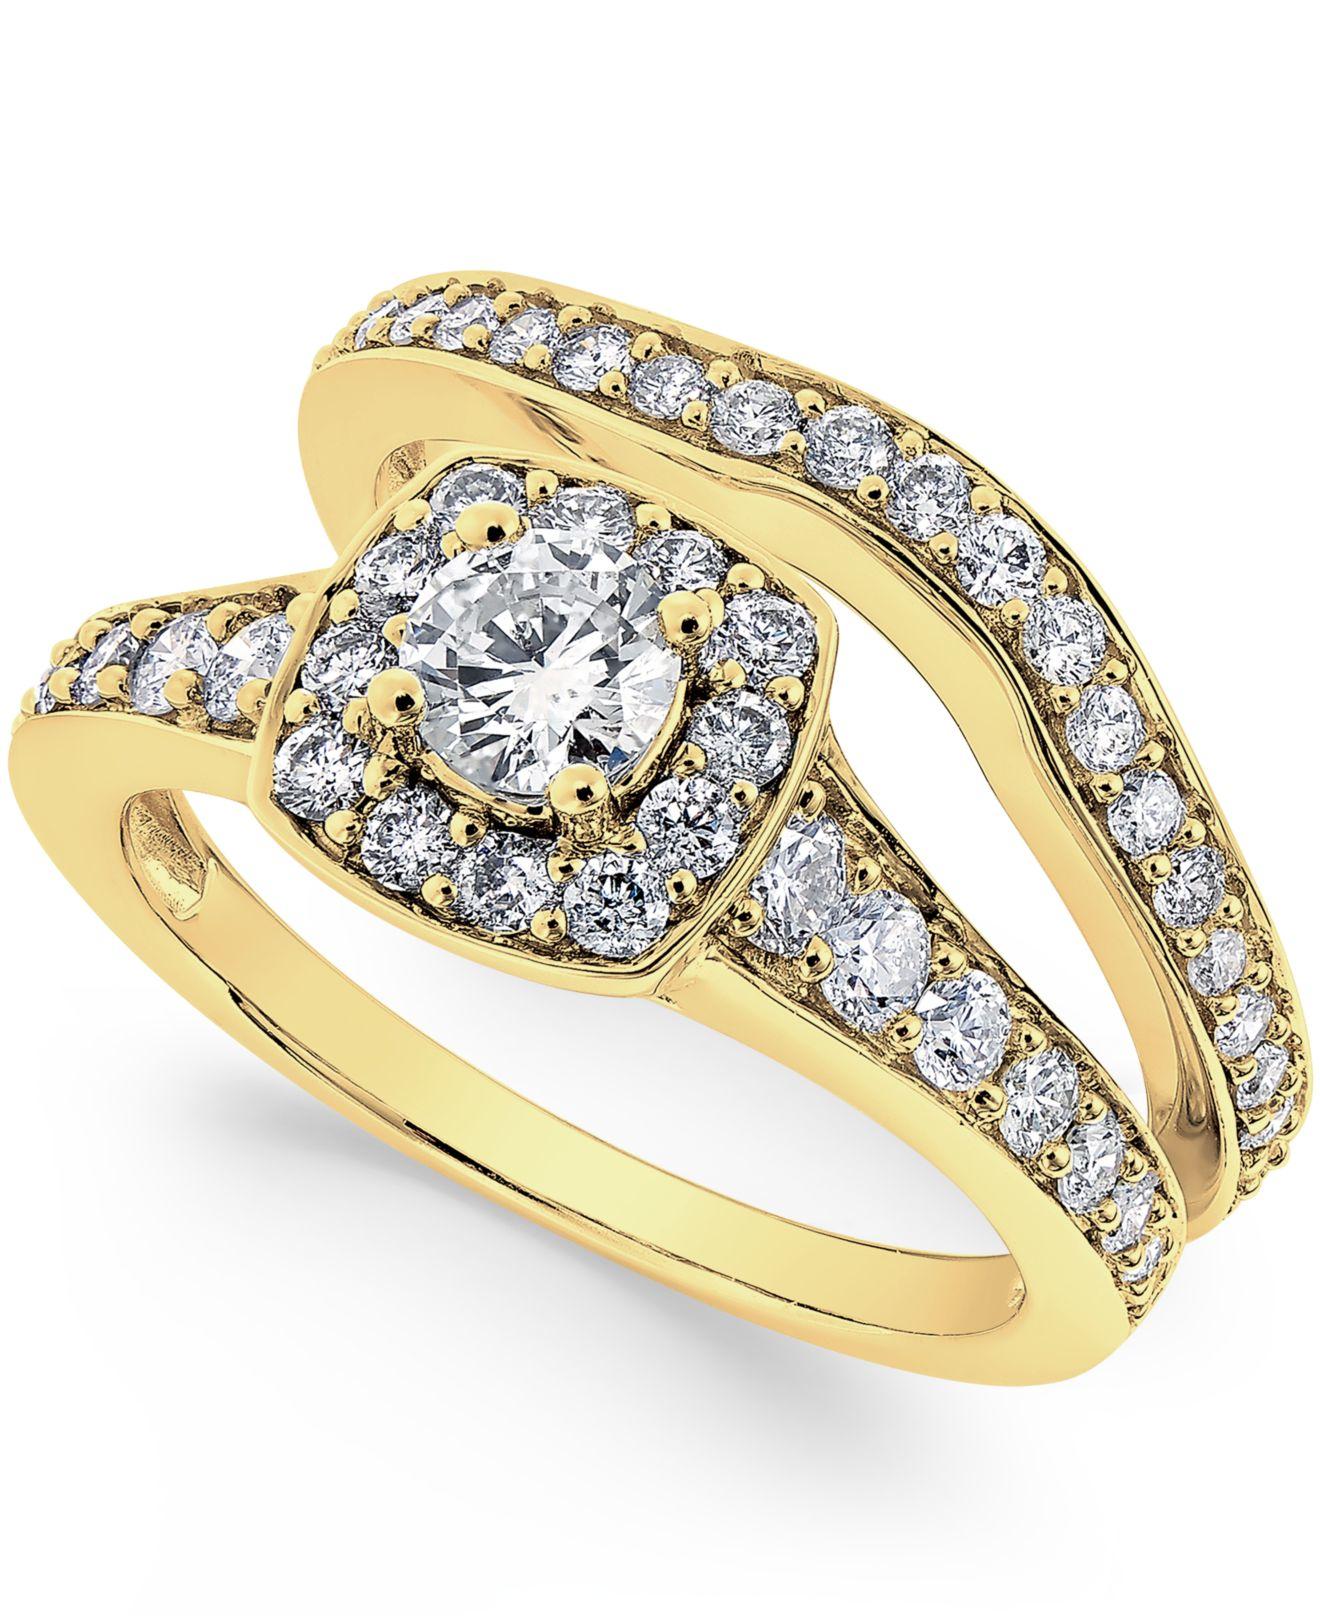 Macy s Diamond Frame Bridal Set 1 1 4 Ct T w In 14k White Gold